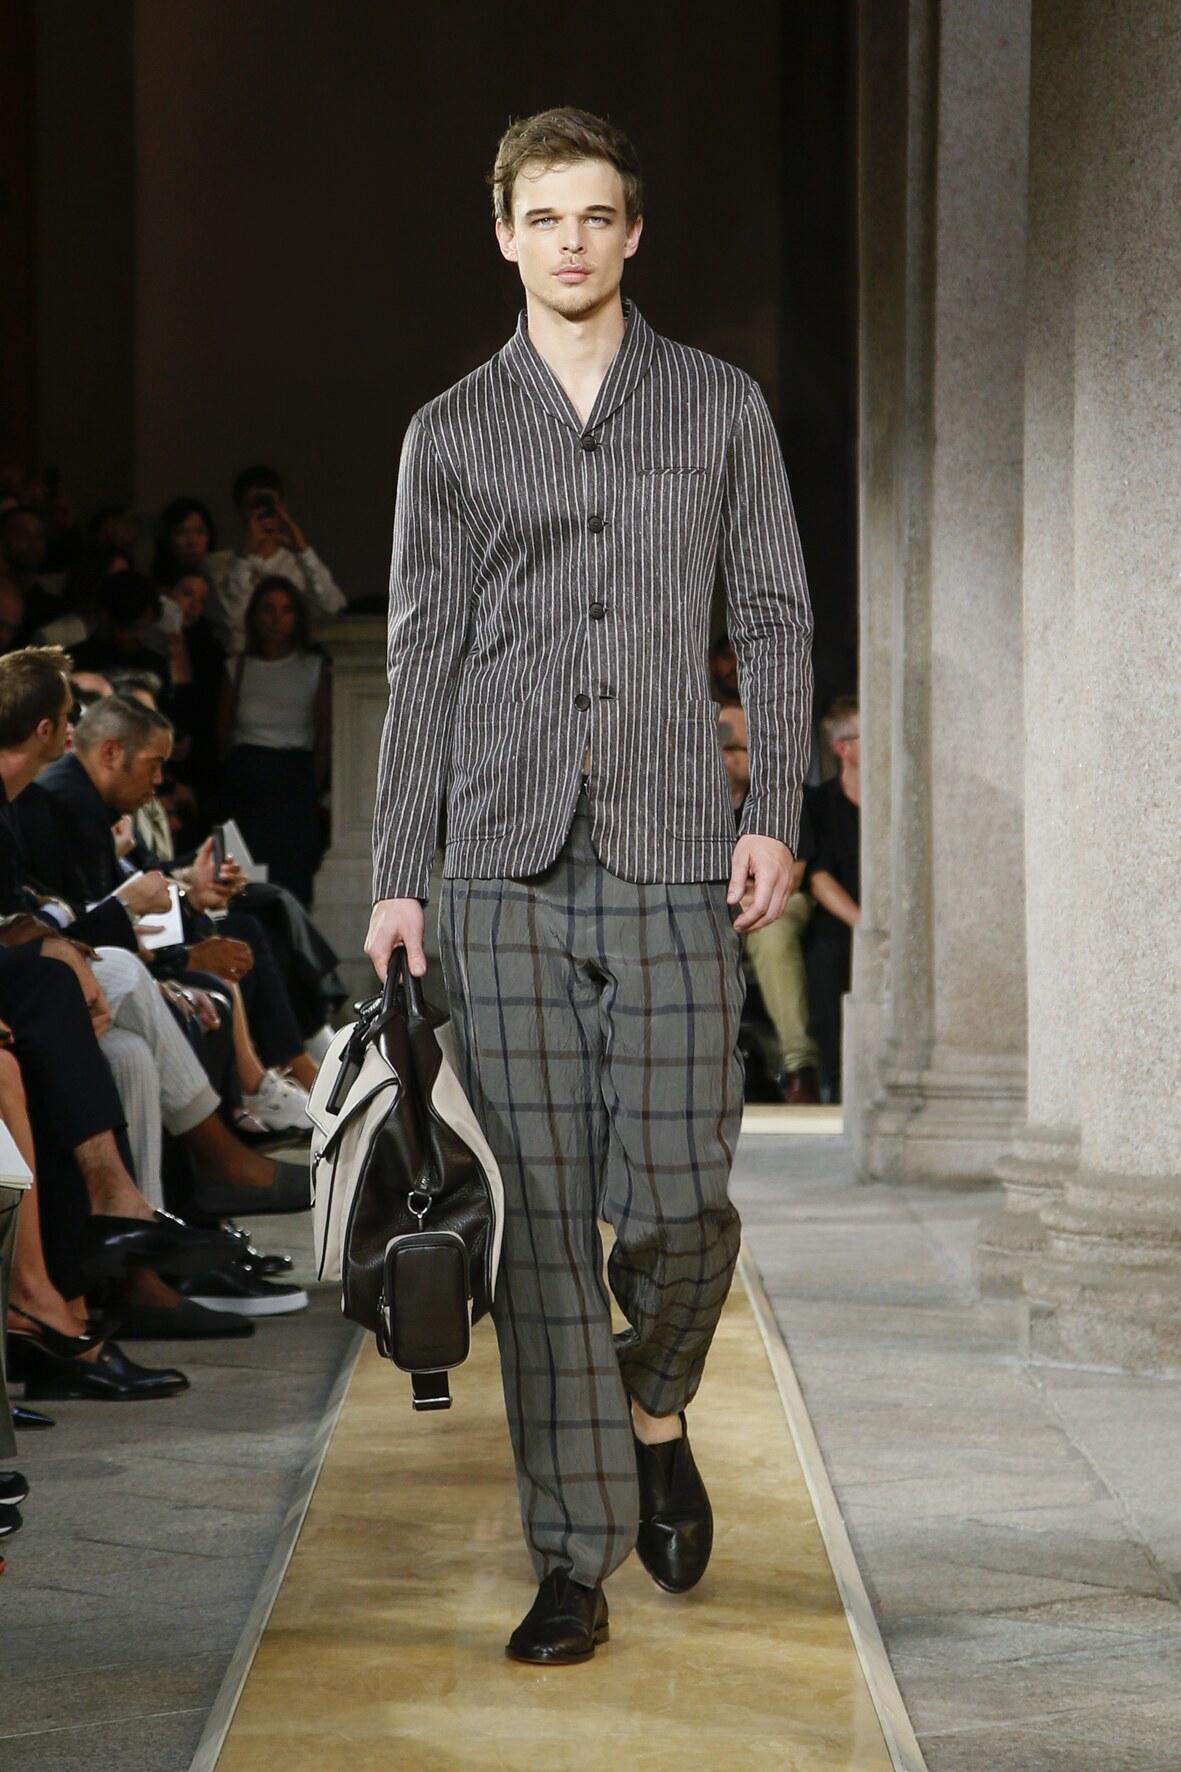 Runway Giorgio Armani Spring Summer 2020 Men's Collection Milan Fashion Week